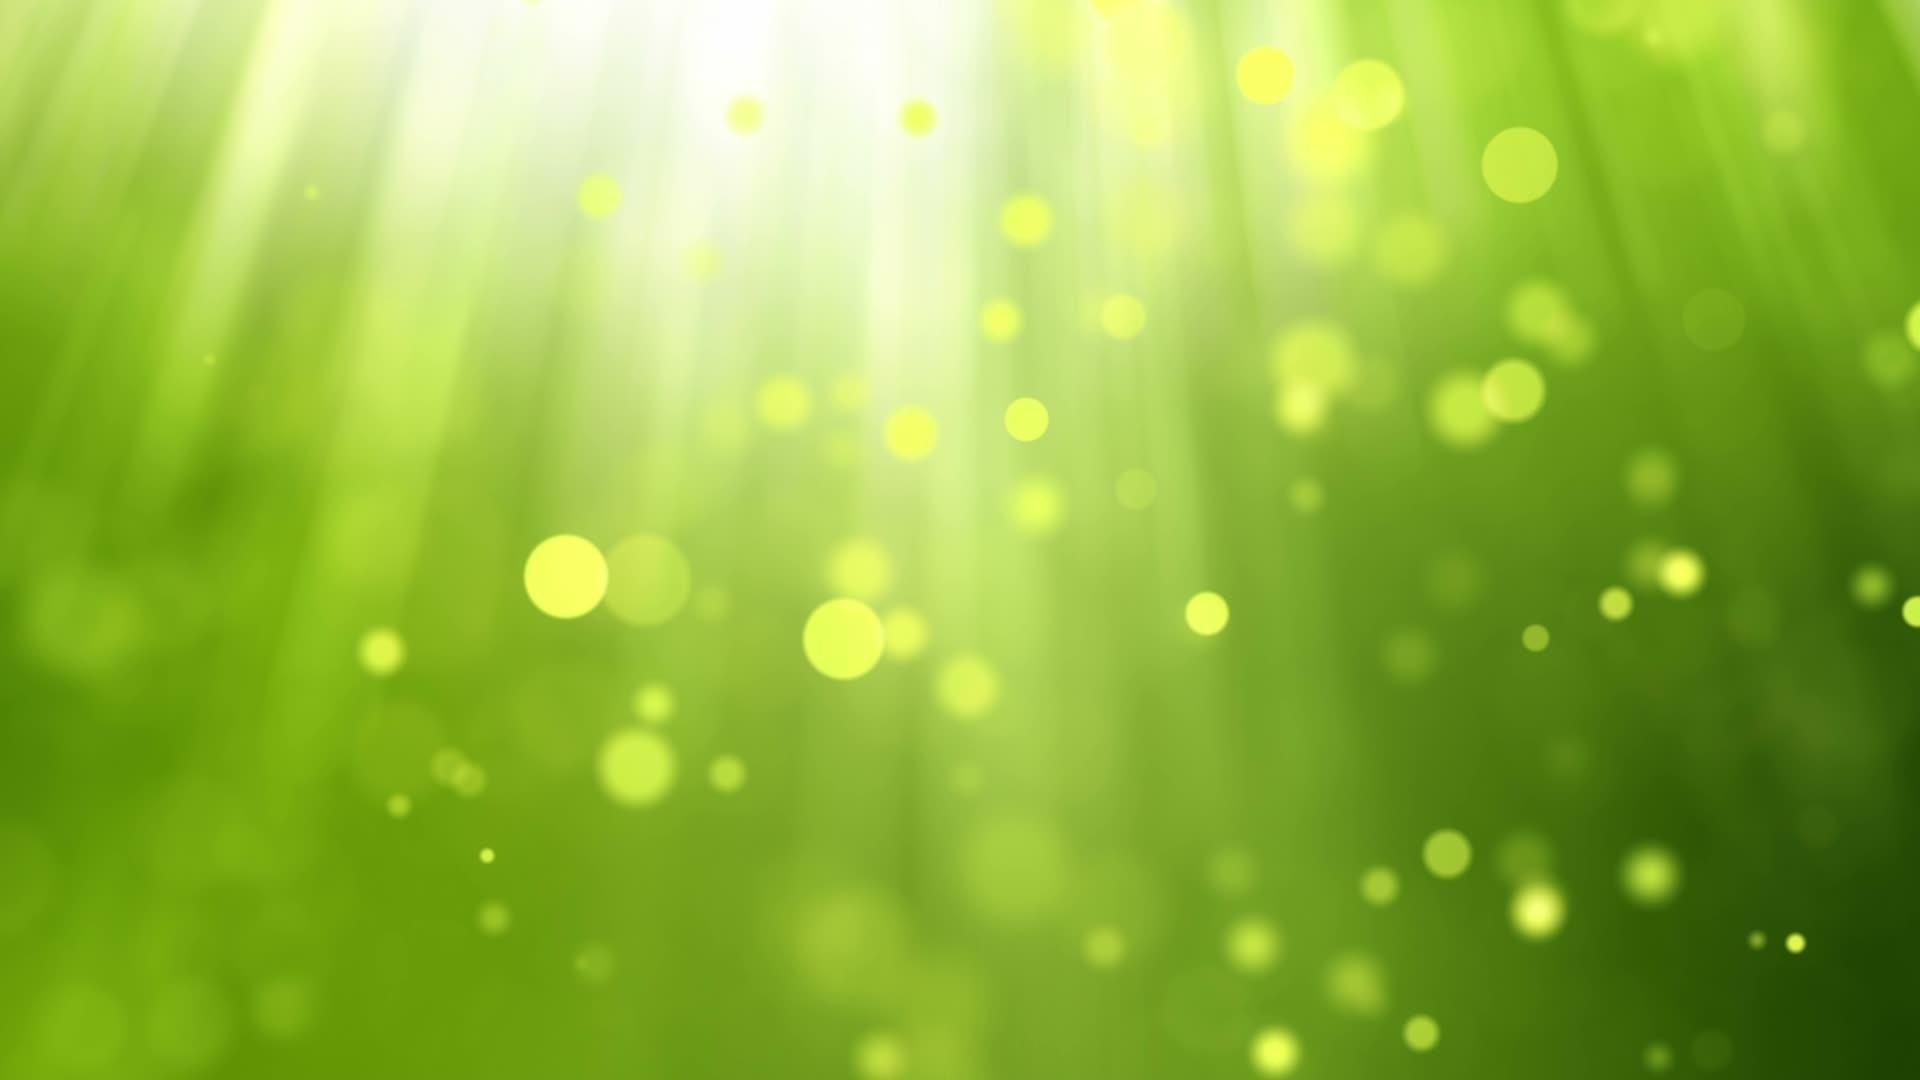 Spark Green Wallpaper theme